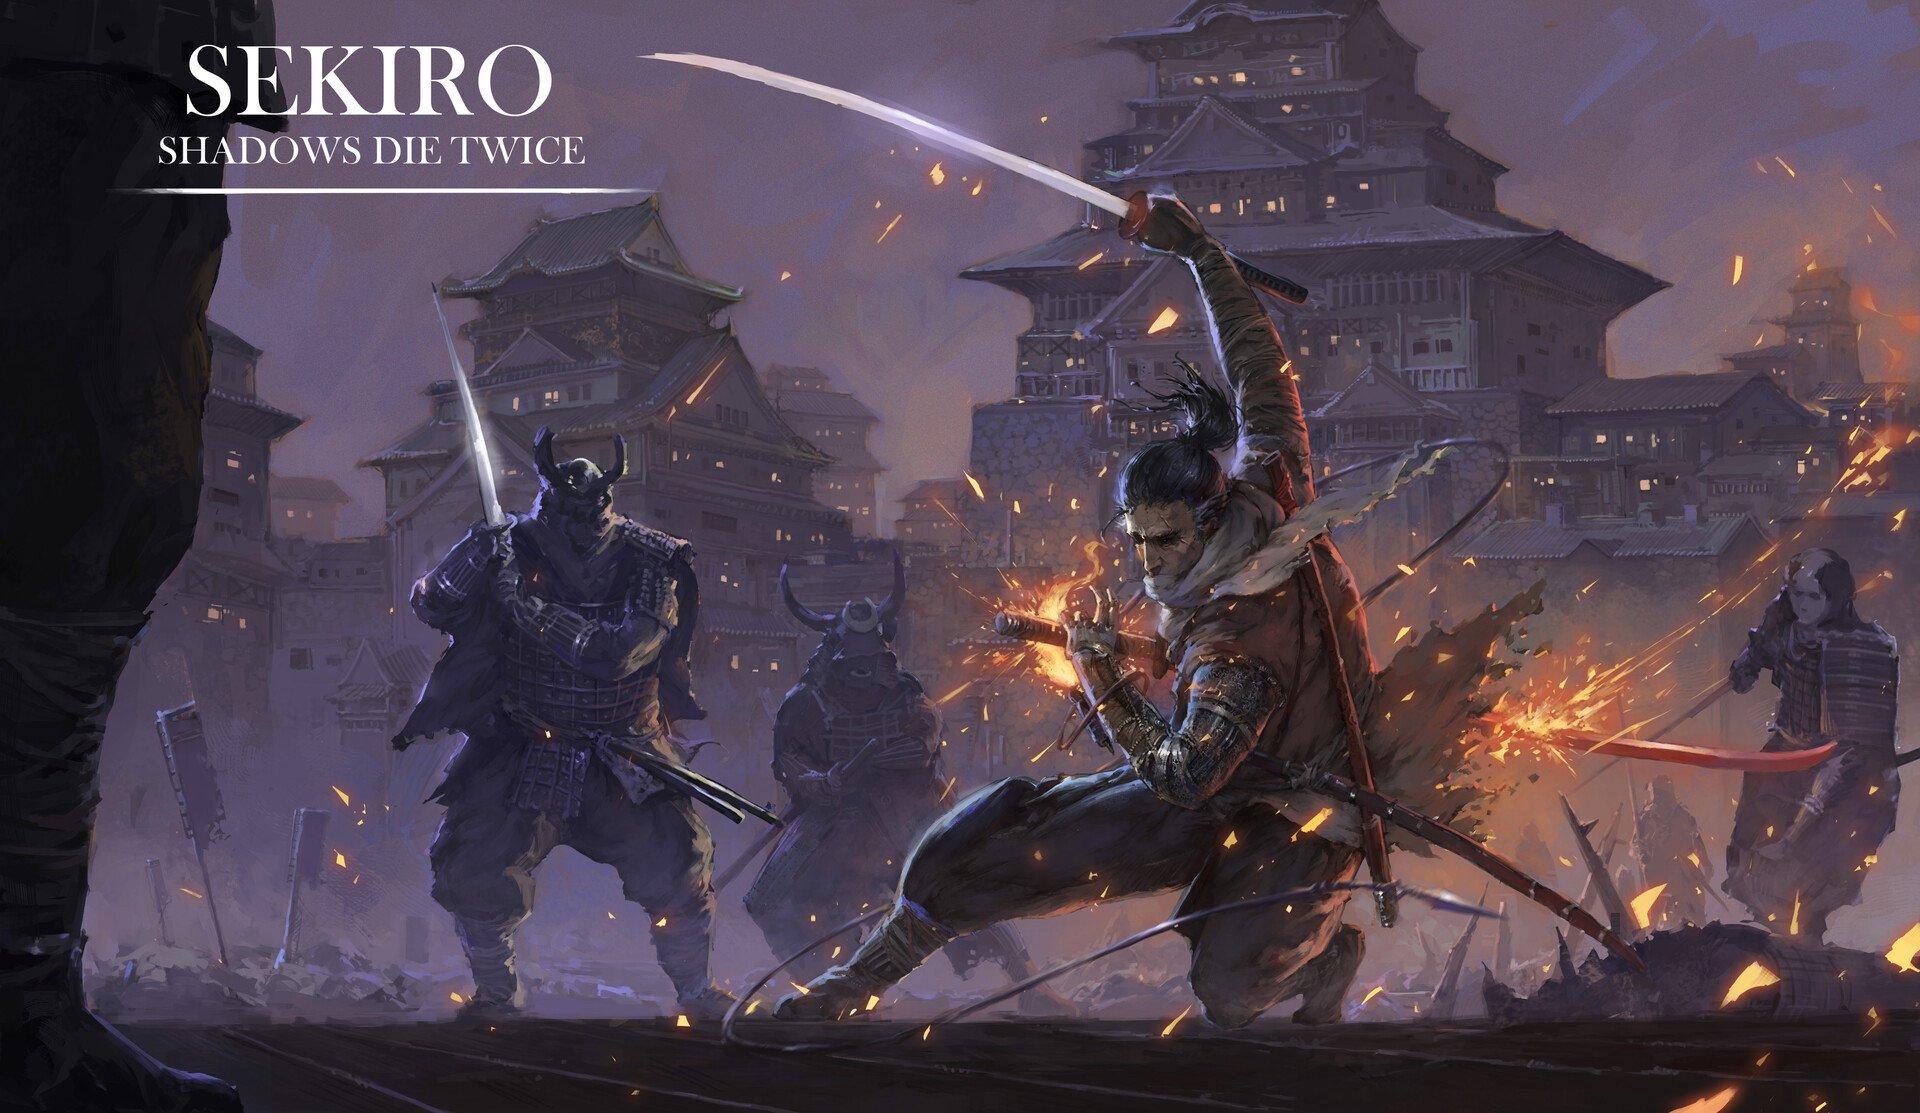 Sekiro Shadows Die Twice Hd Wallpaper Background Image